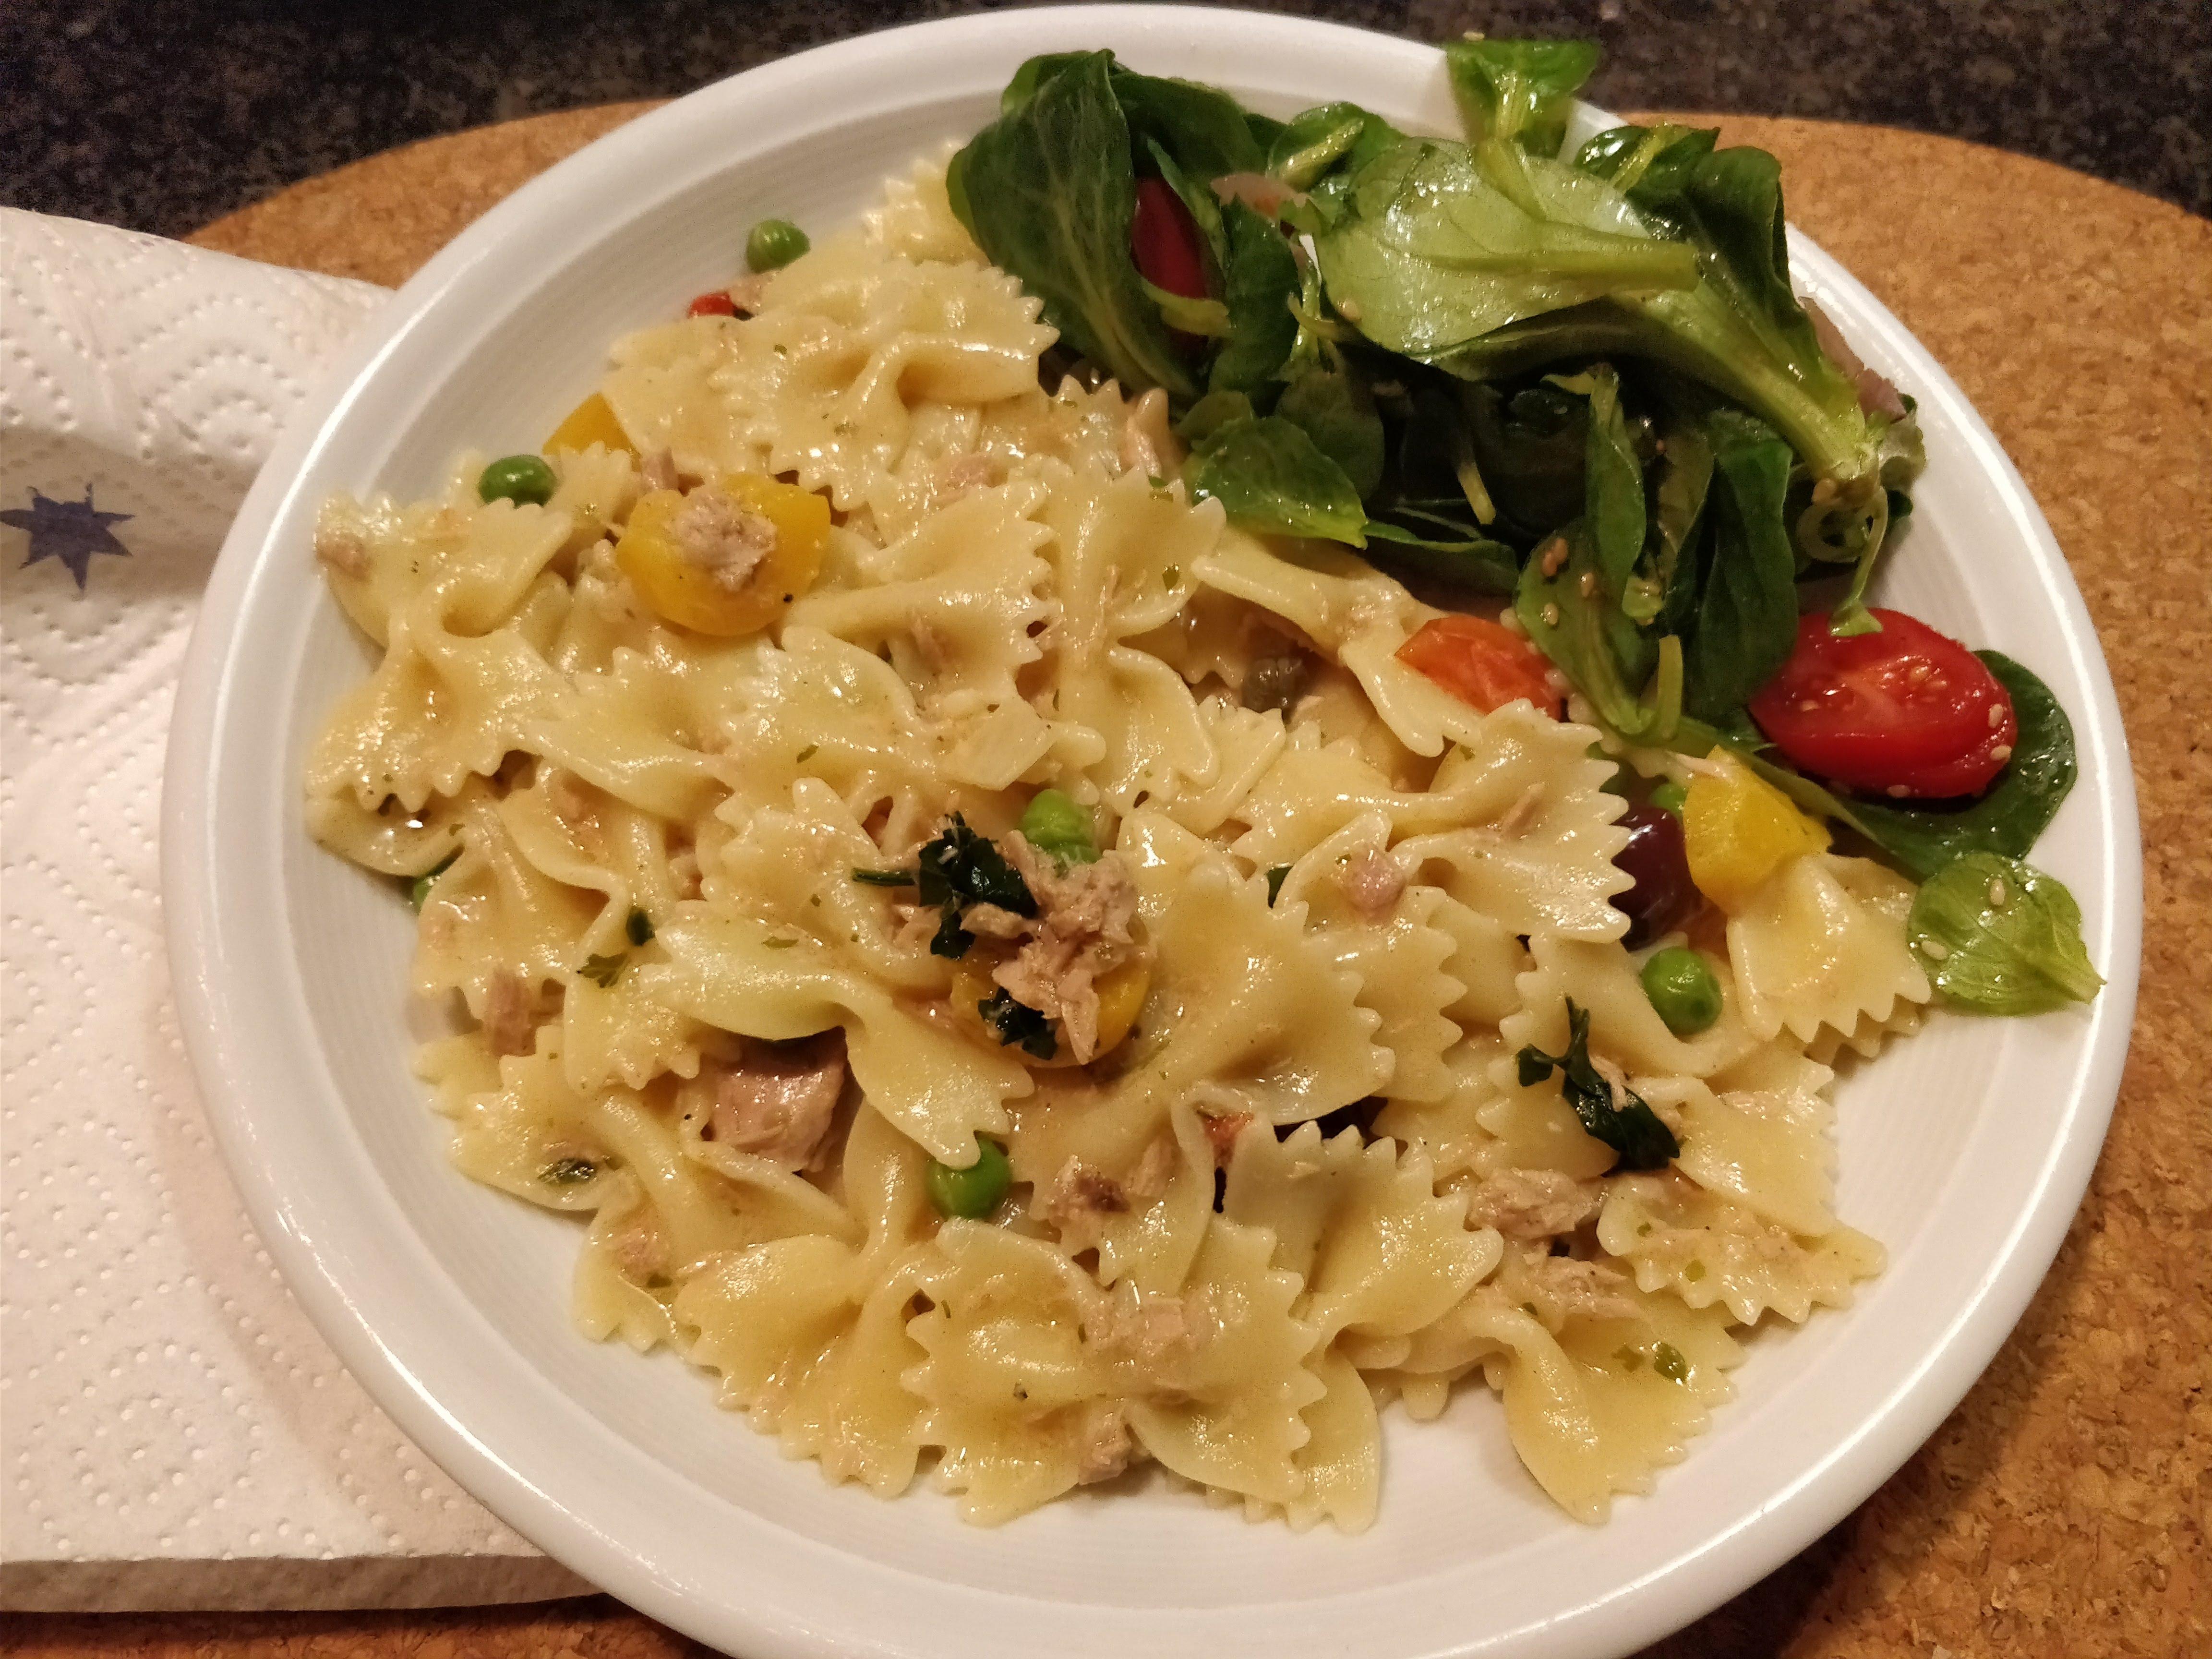 https://foodloader.net/nico_2017-12-17_farfalle-mit-thunfisch-sahne-sauce.jpg